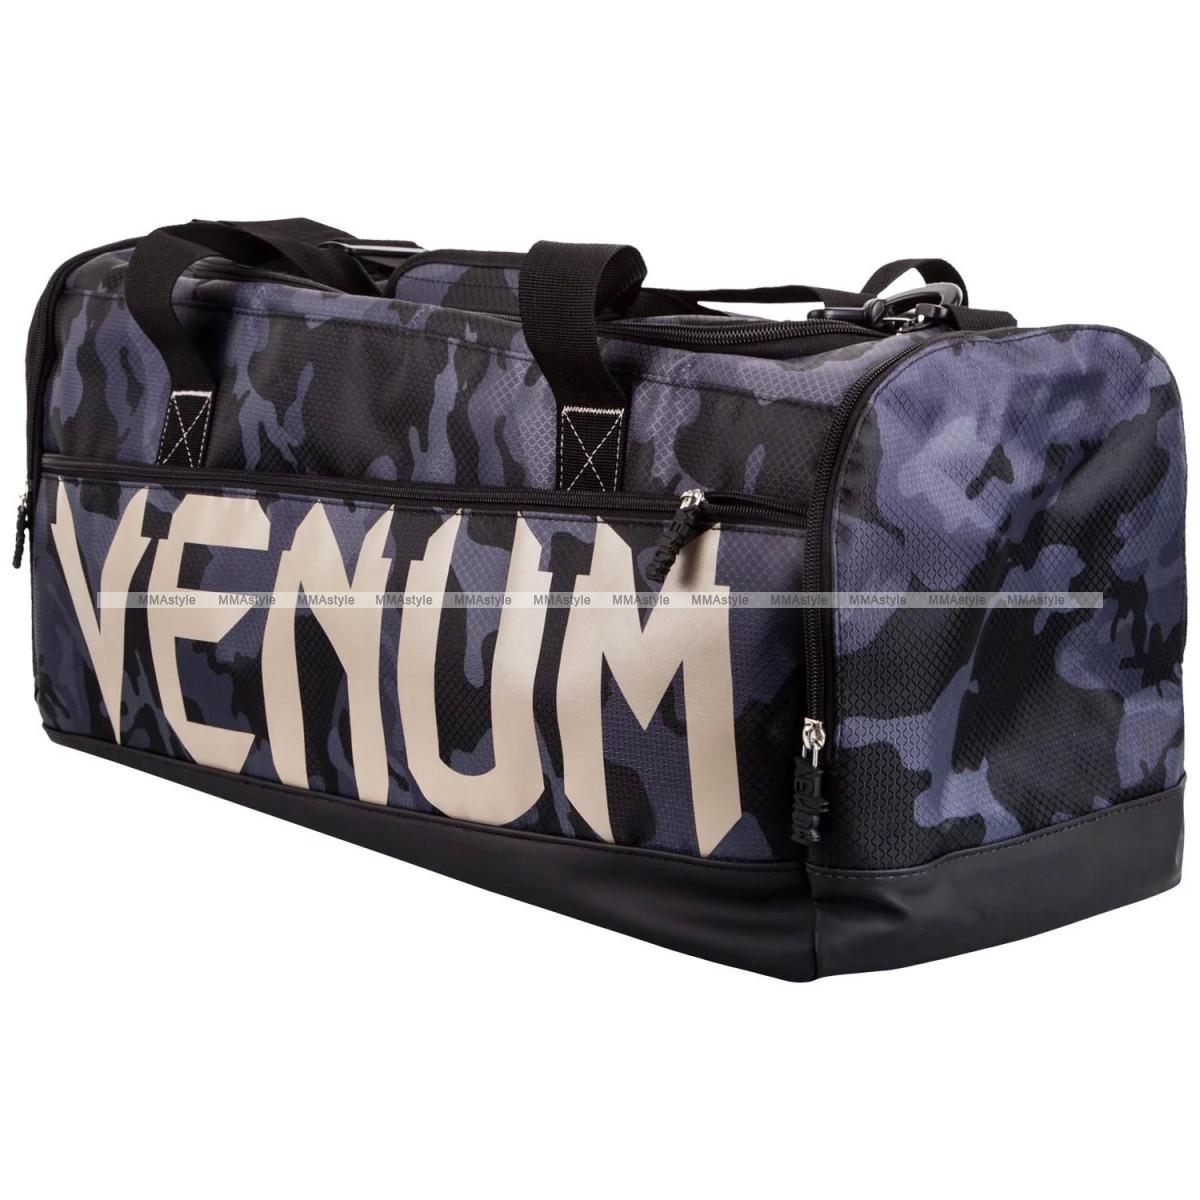 Сумка Venum Sparring Sport Bag Dark Camo